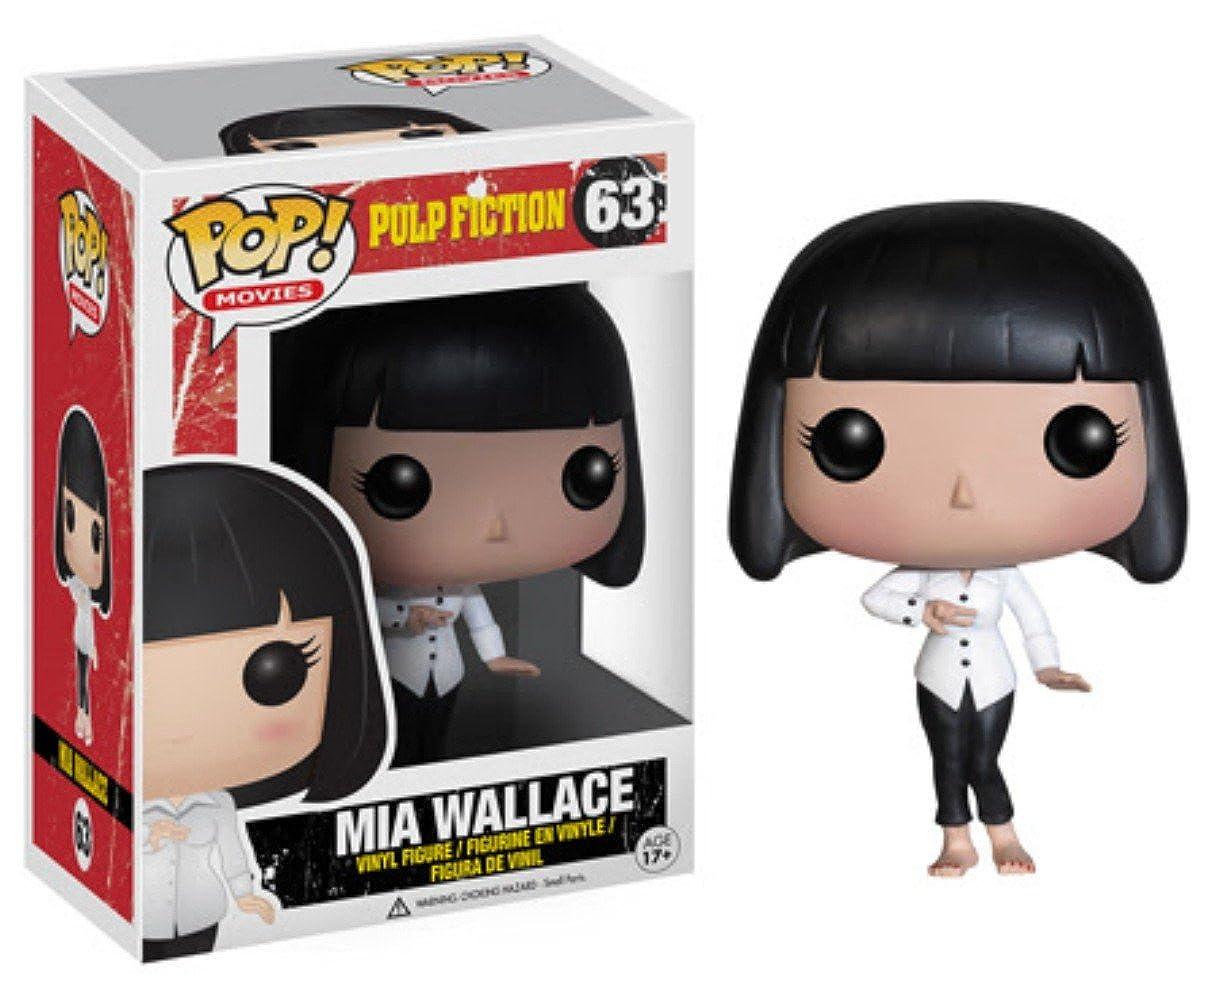 Mia Wallace Pulp Fiction Shoes Fiction Mia Wallace Vinyl